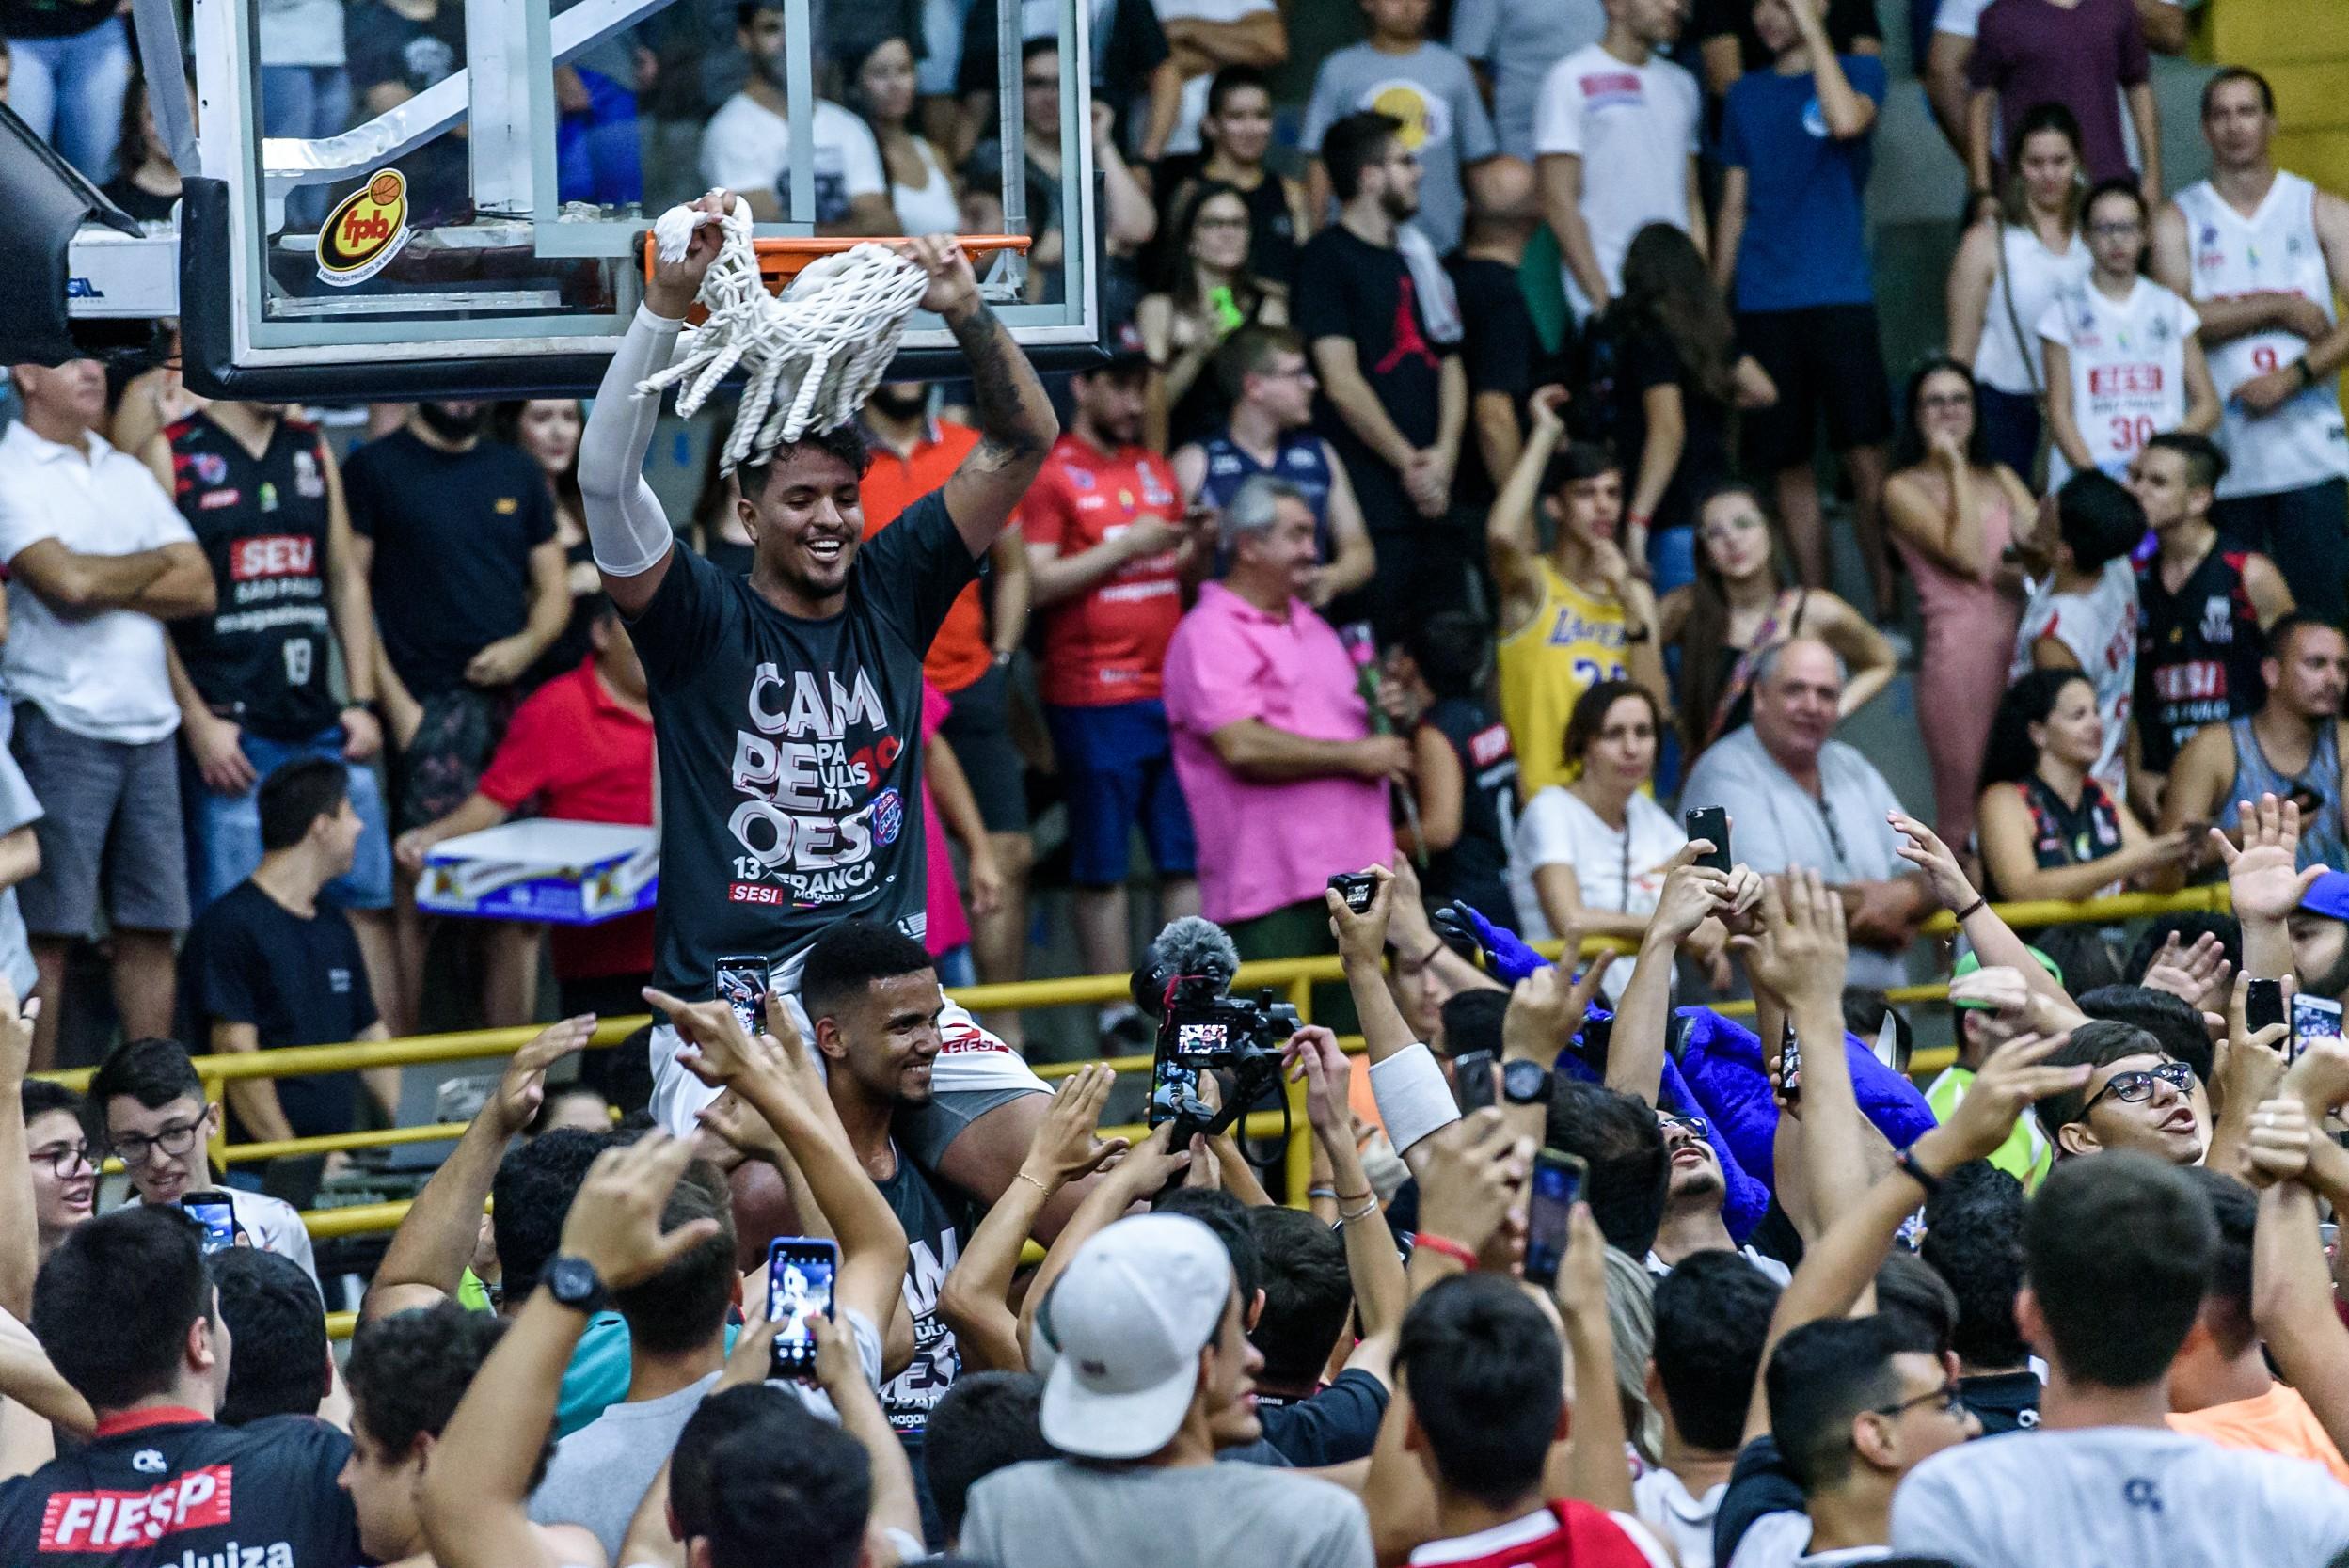 Bicampeonato paulista será transmitido na 5ª live do Sesi Franca Basquete